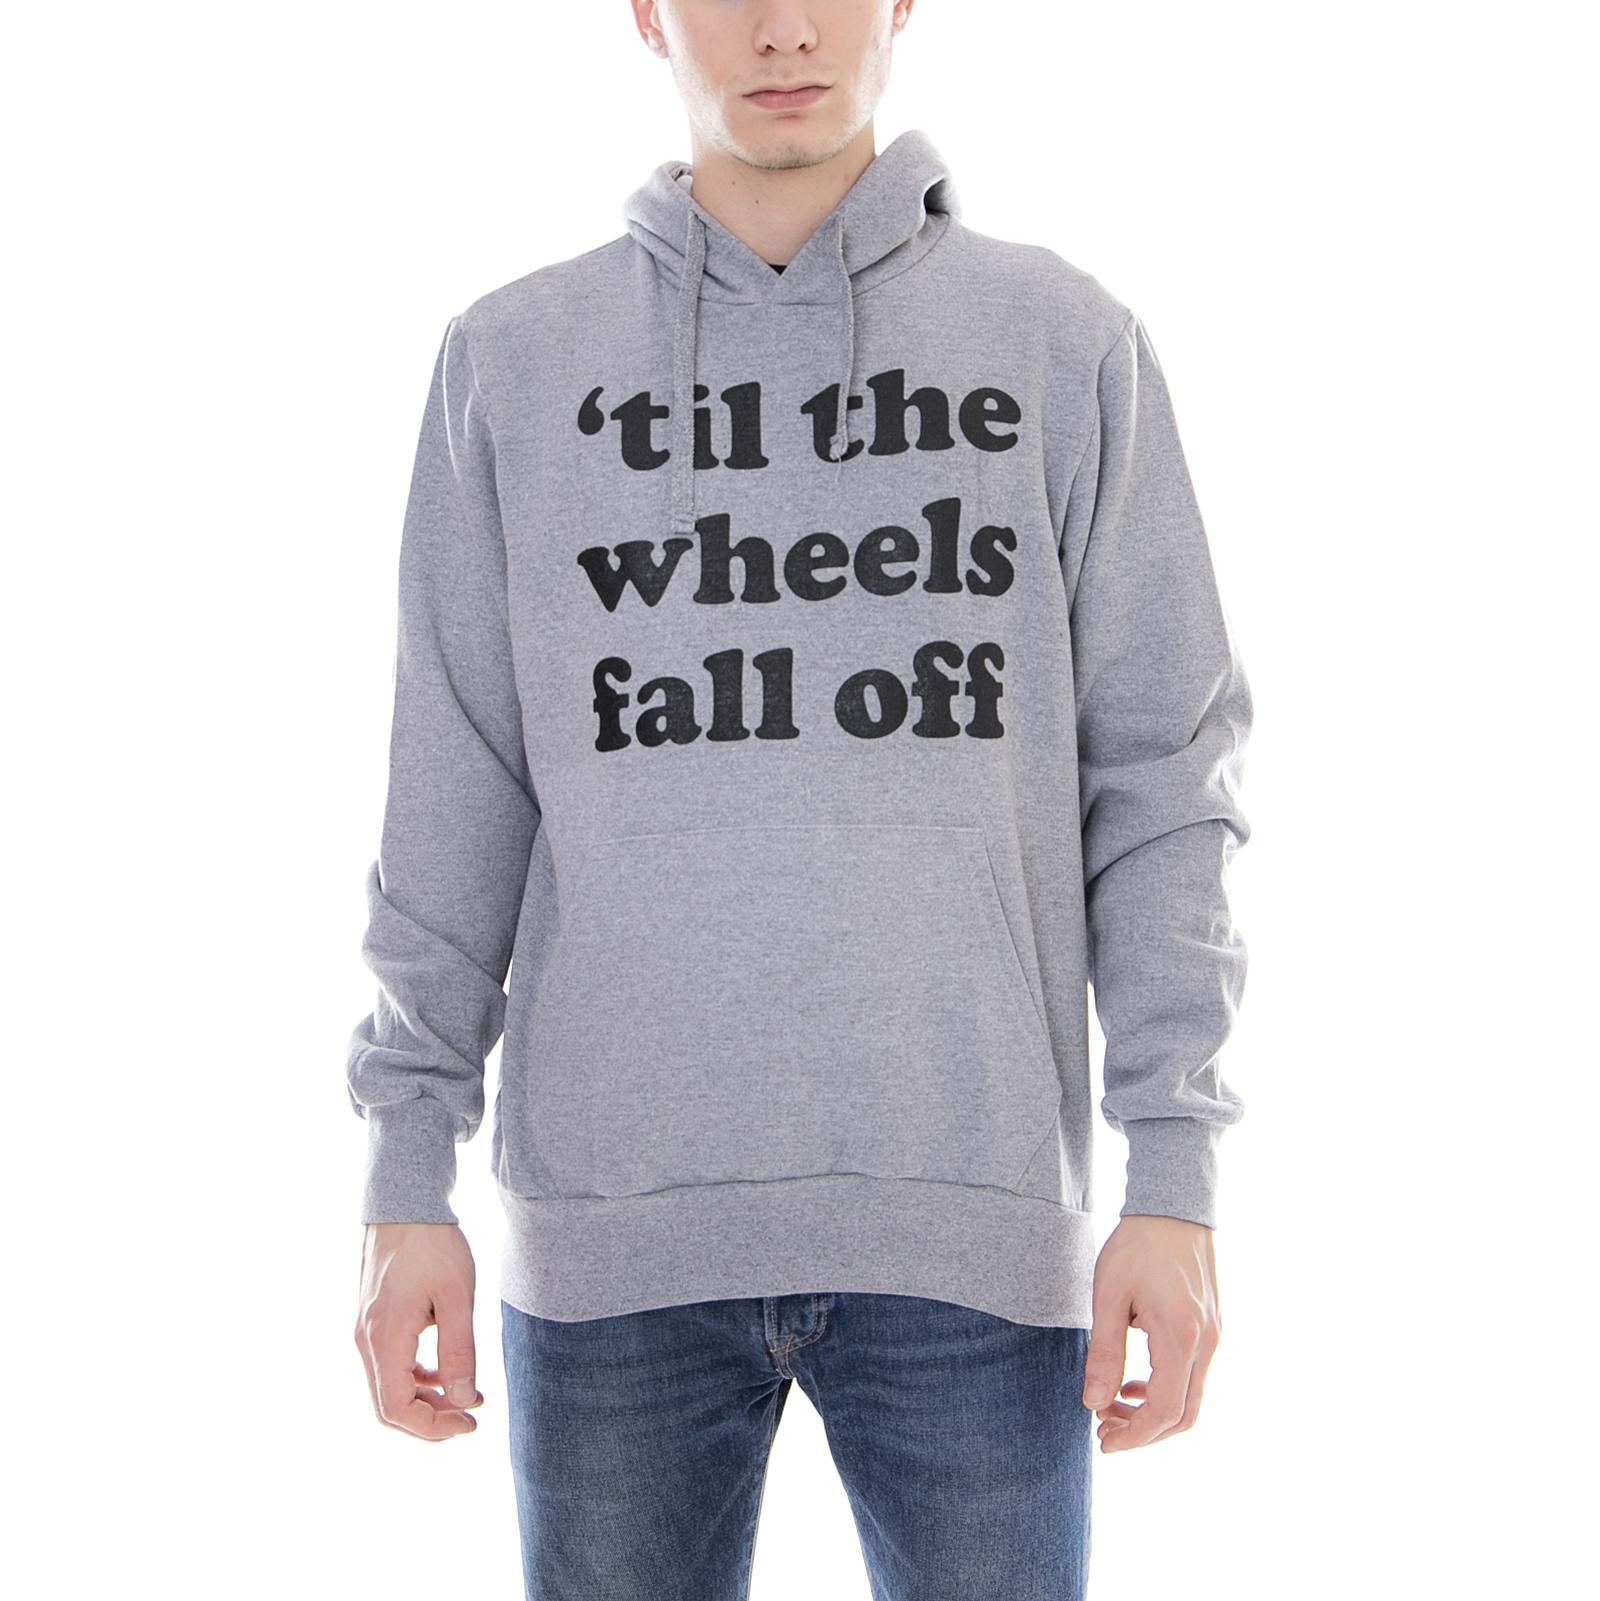 C1rca Felpe Wheels Hood Athletic Grau Grigio